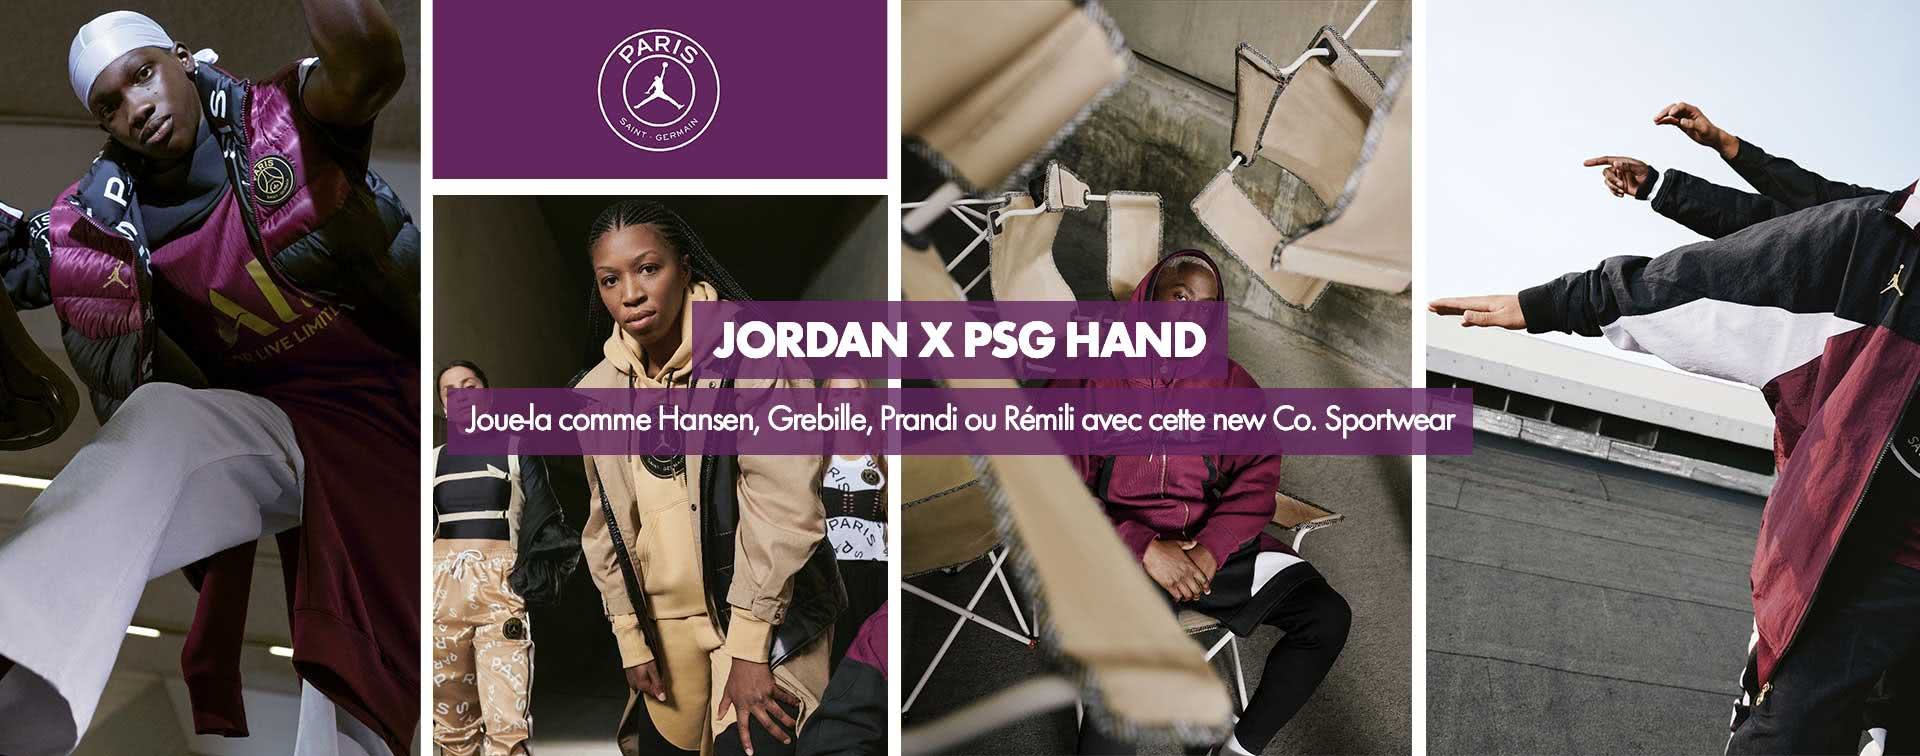 PSG HAND x JORDAN sportswear